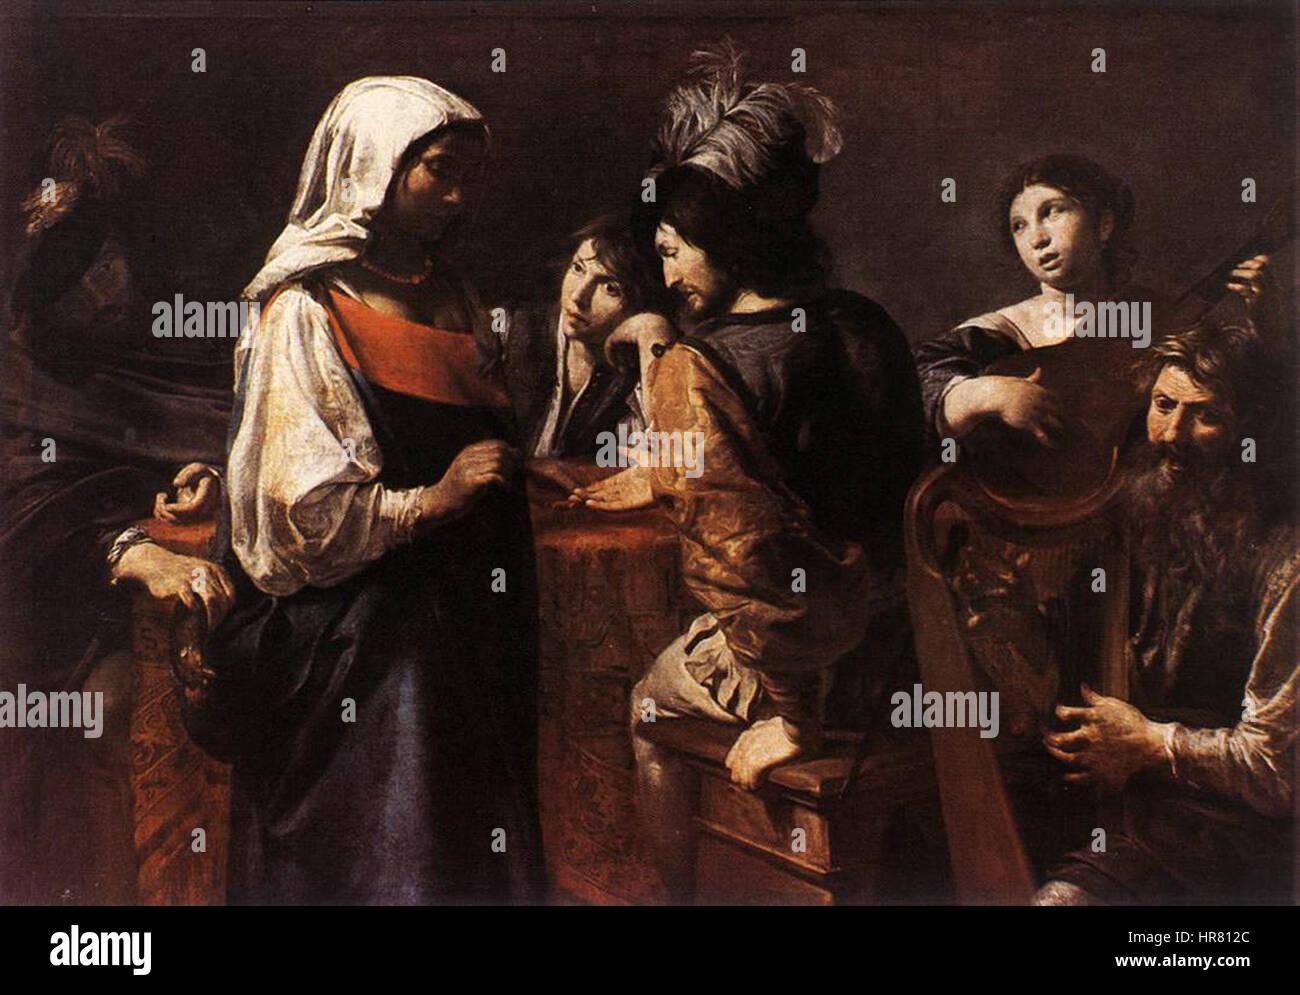 Valentin de Boulogne - The Fortune Teller - WGA24239 - Stock Image